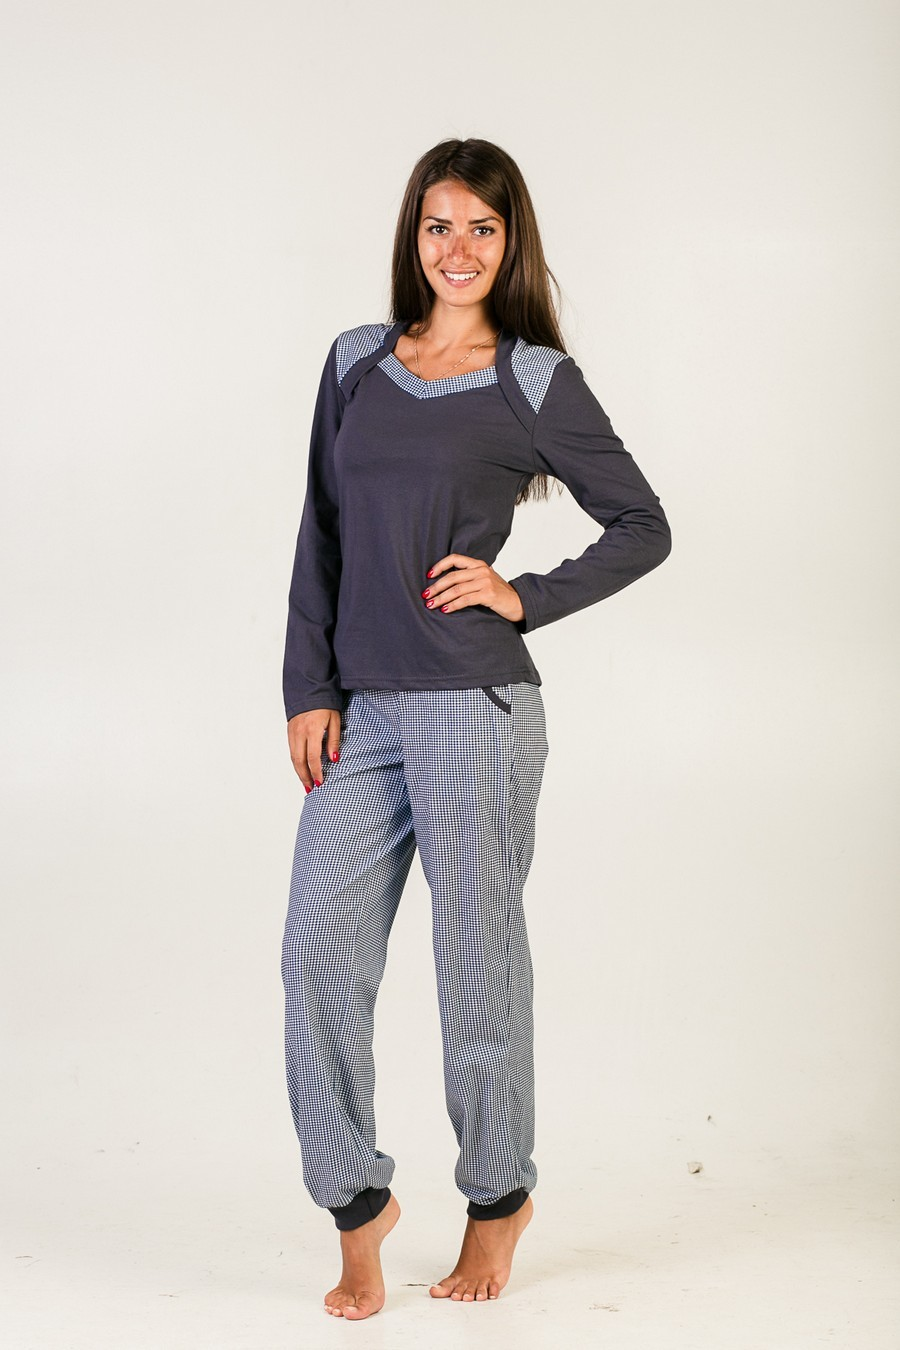 Комплект Меланж Клетка (блузка+брюки)Коллекция ОСЕНЬ-ЗИМА<br><br><br>Размер: 44